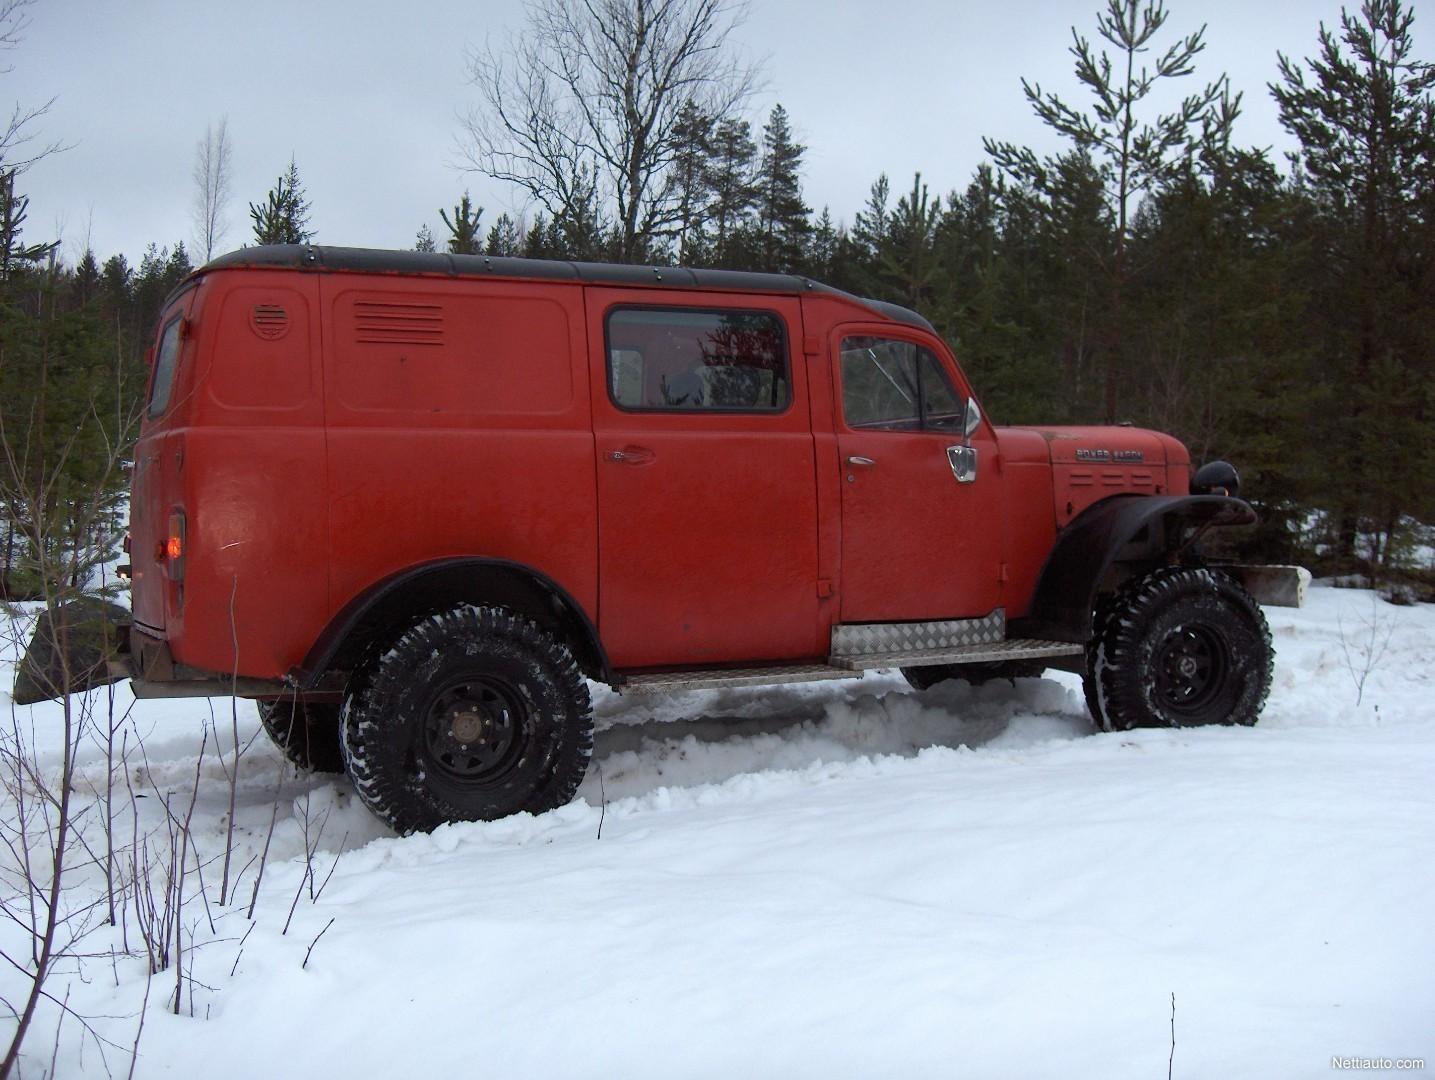 Dodge Powerwagon W 300 M 4x4 1961 Used Vehicle Nettiauto 1949 Power Wagon